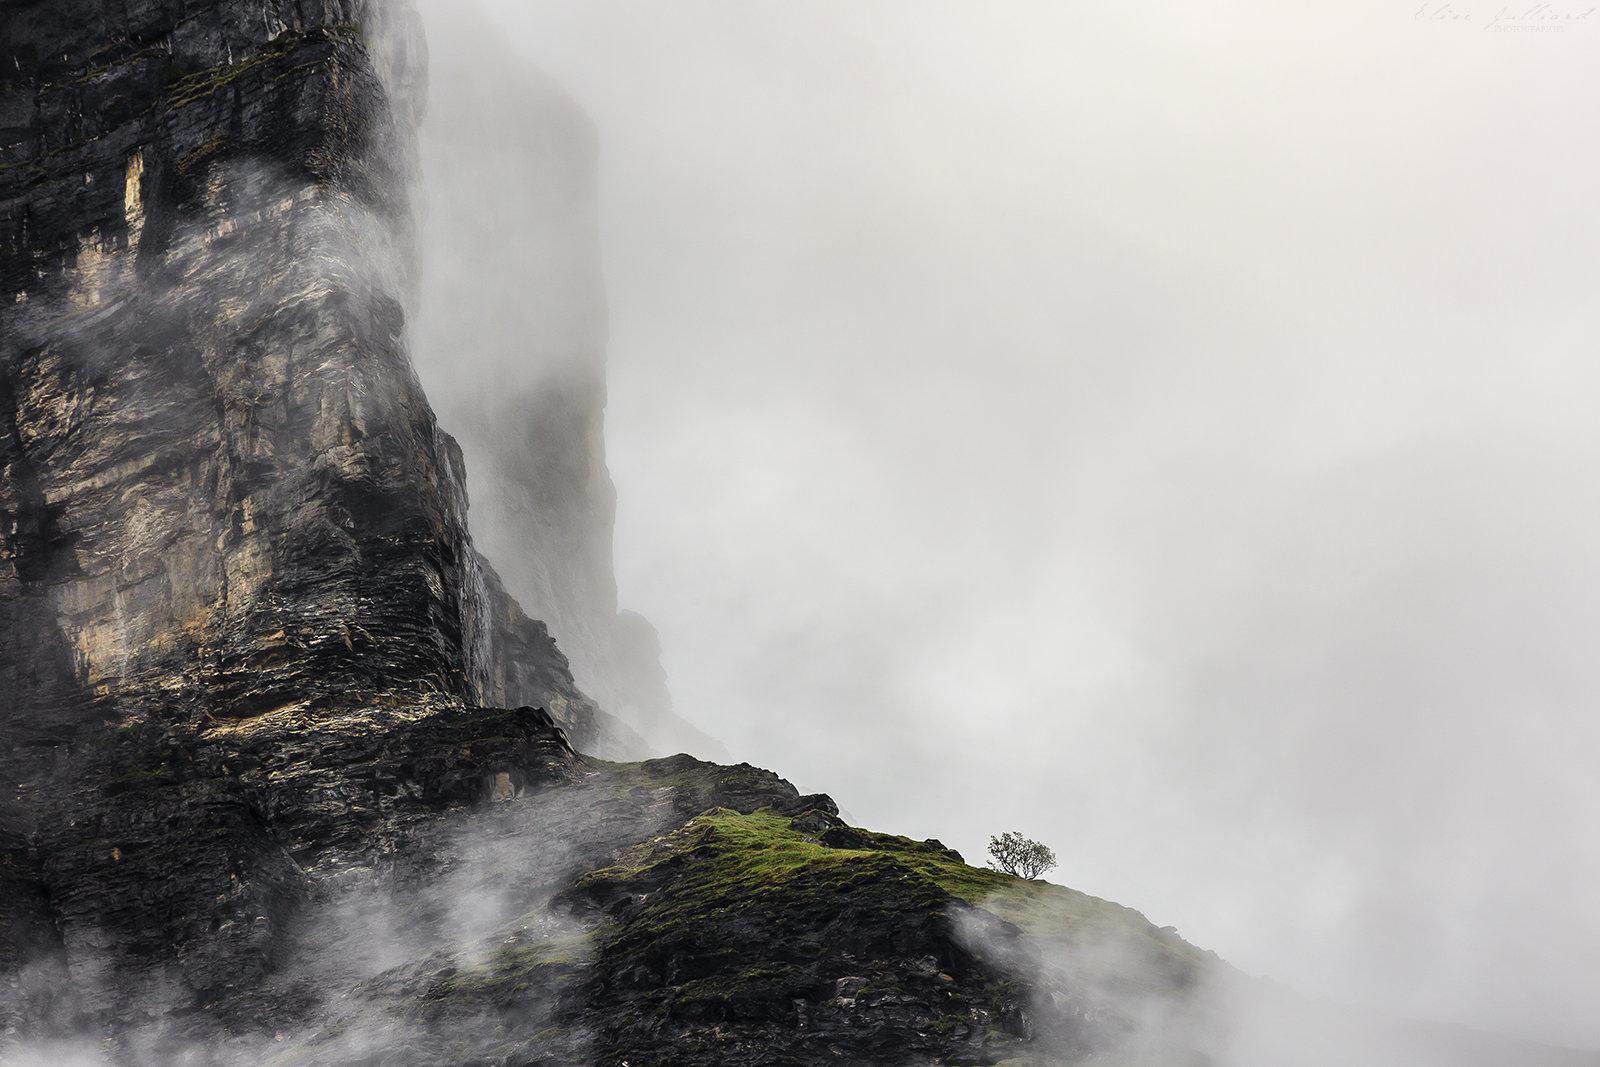 elise-julliard-photographe-rhone-alpes-haute-savoie-sixt-fer-a-cheval-brume